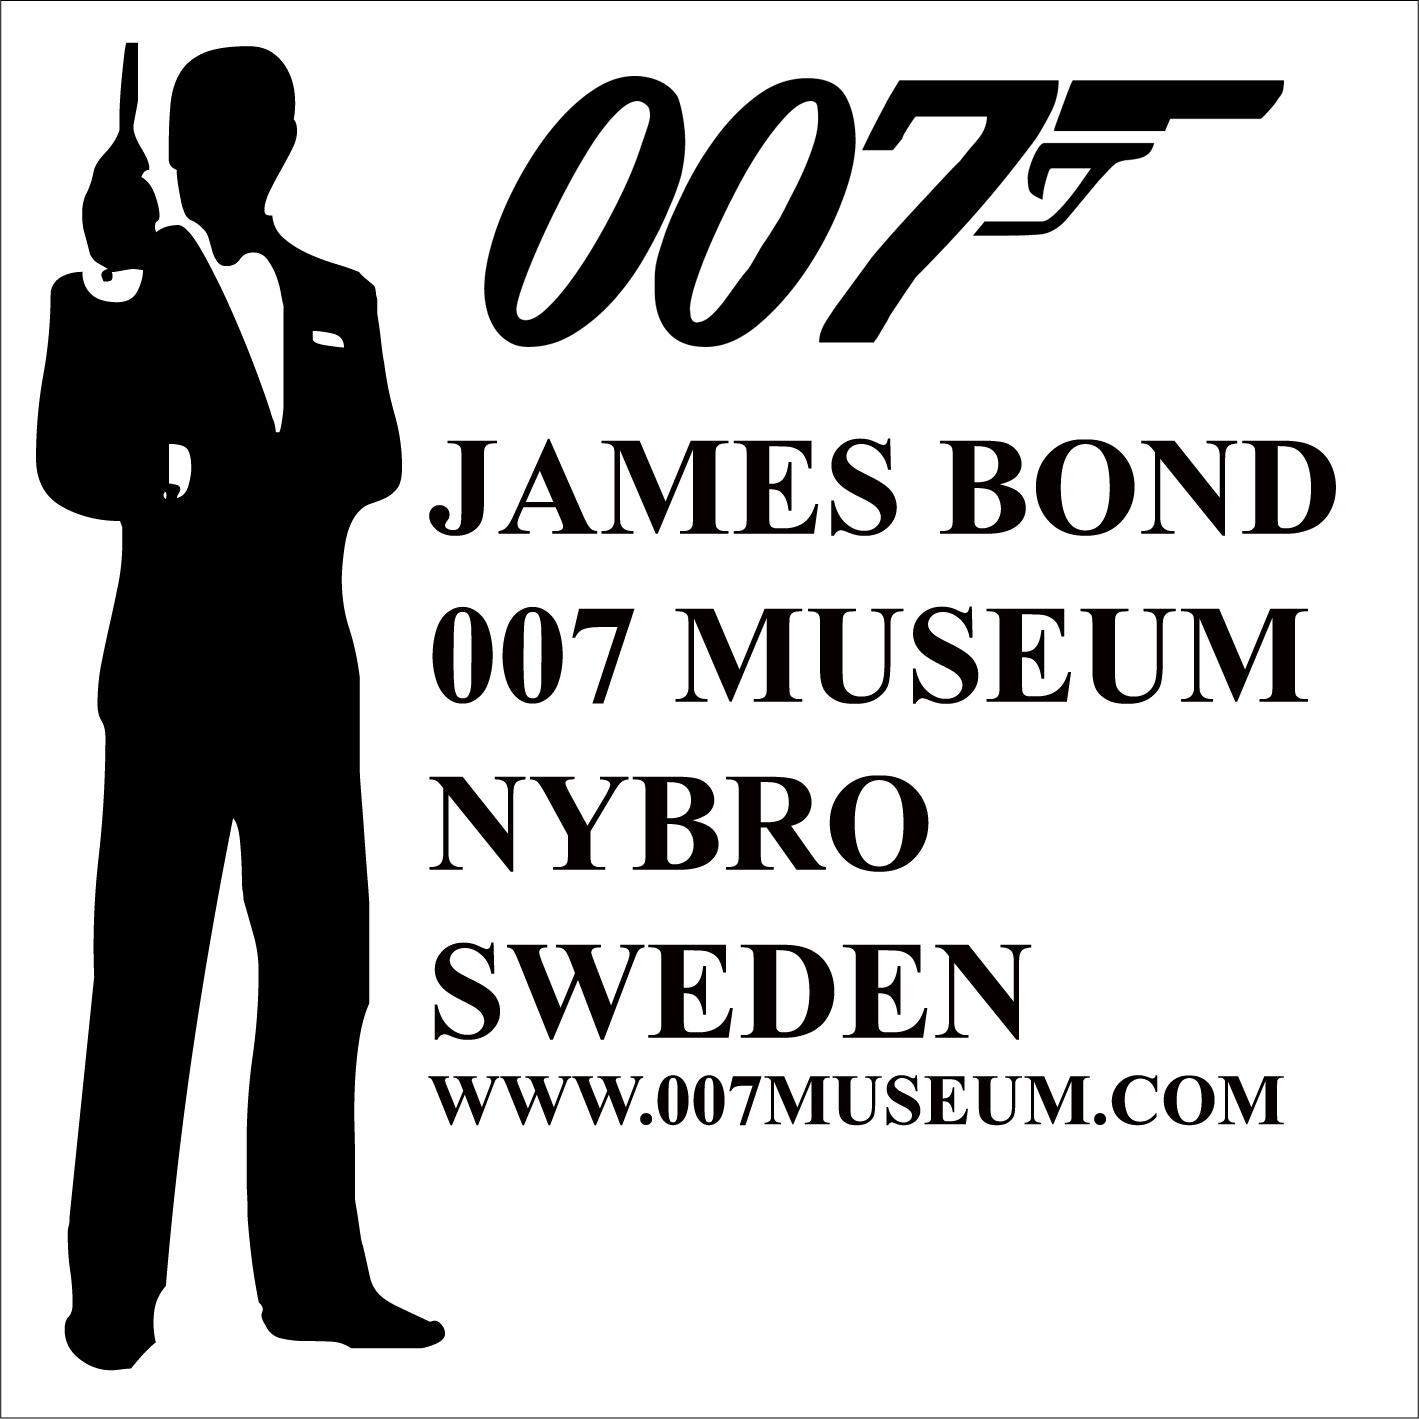 James bond theme party ppkguns omega bmw bollinger corgi swatch posters james bond store links